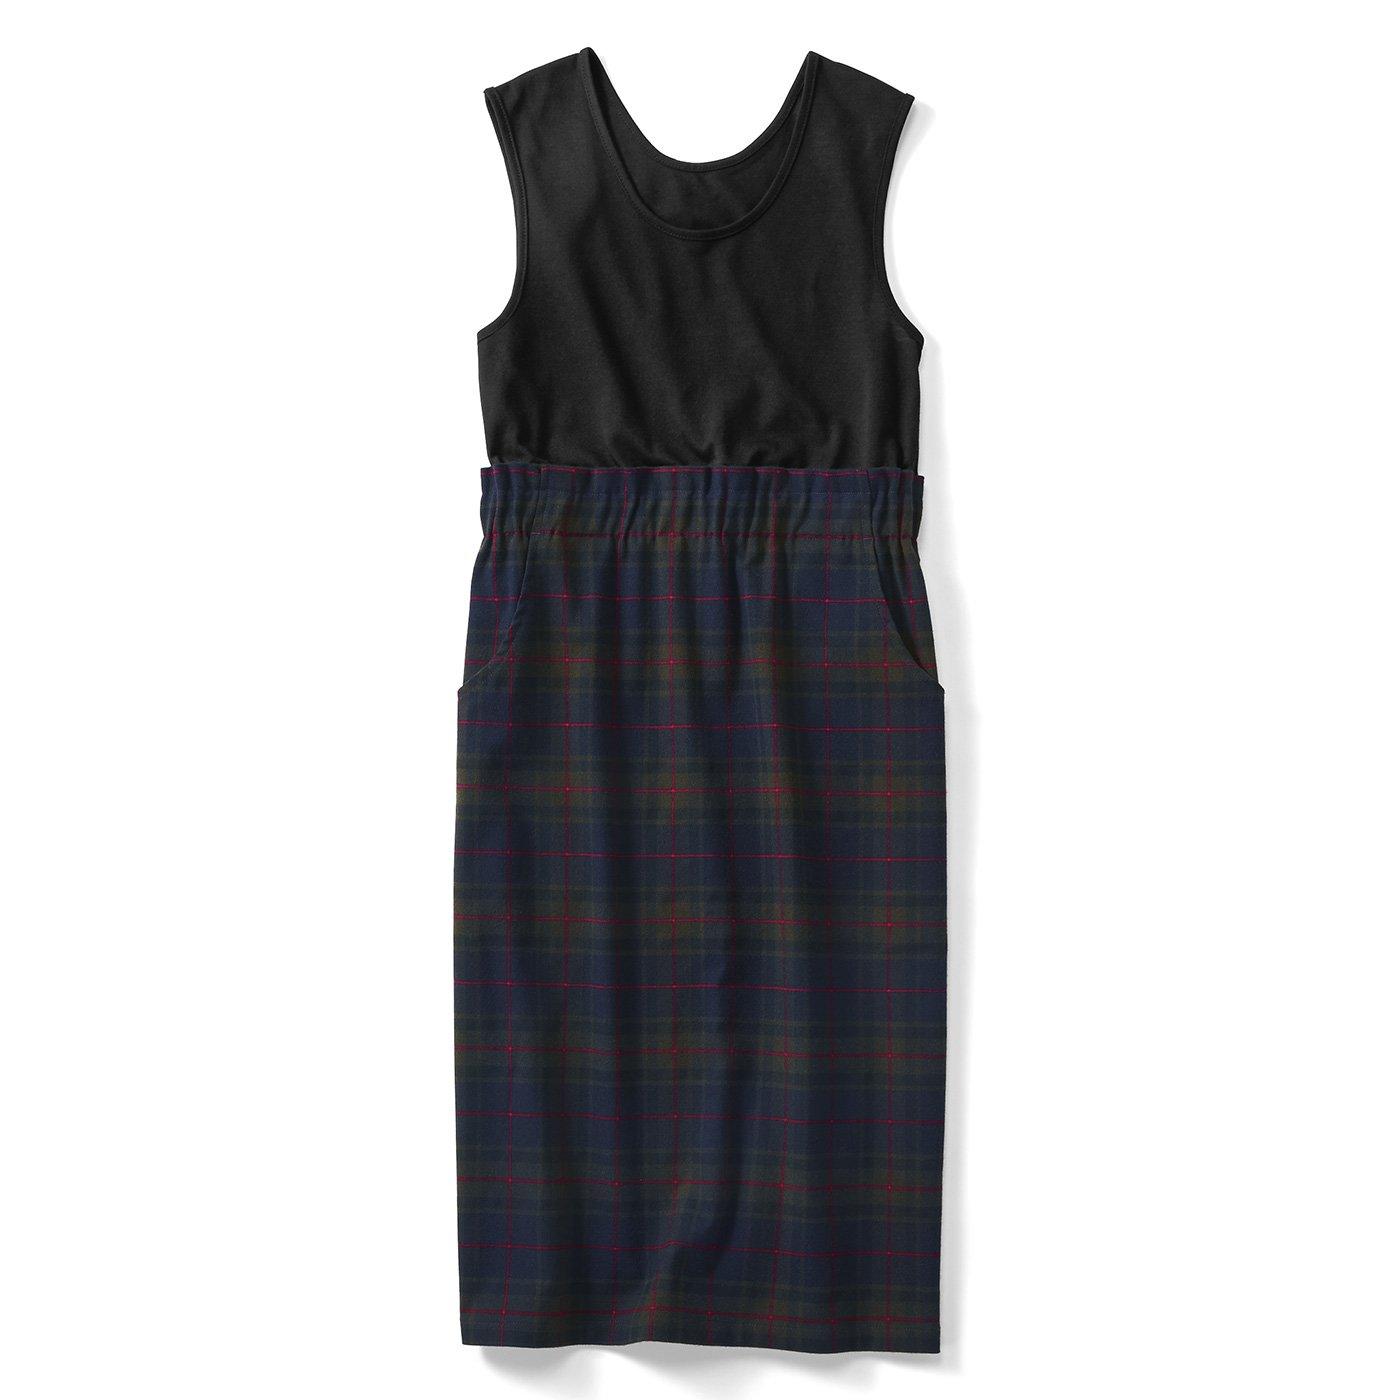 IEDIT[イディット] 上から吊ってるみたいでウエスト快適 タンクトップ付き 着映えチェック柄のIラインスカート〈ネイビー〉